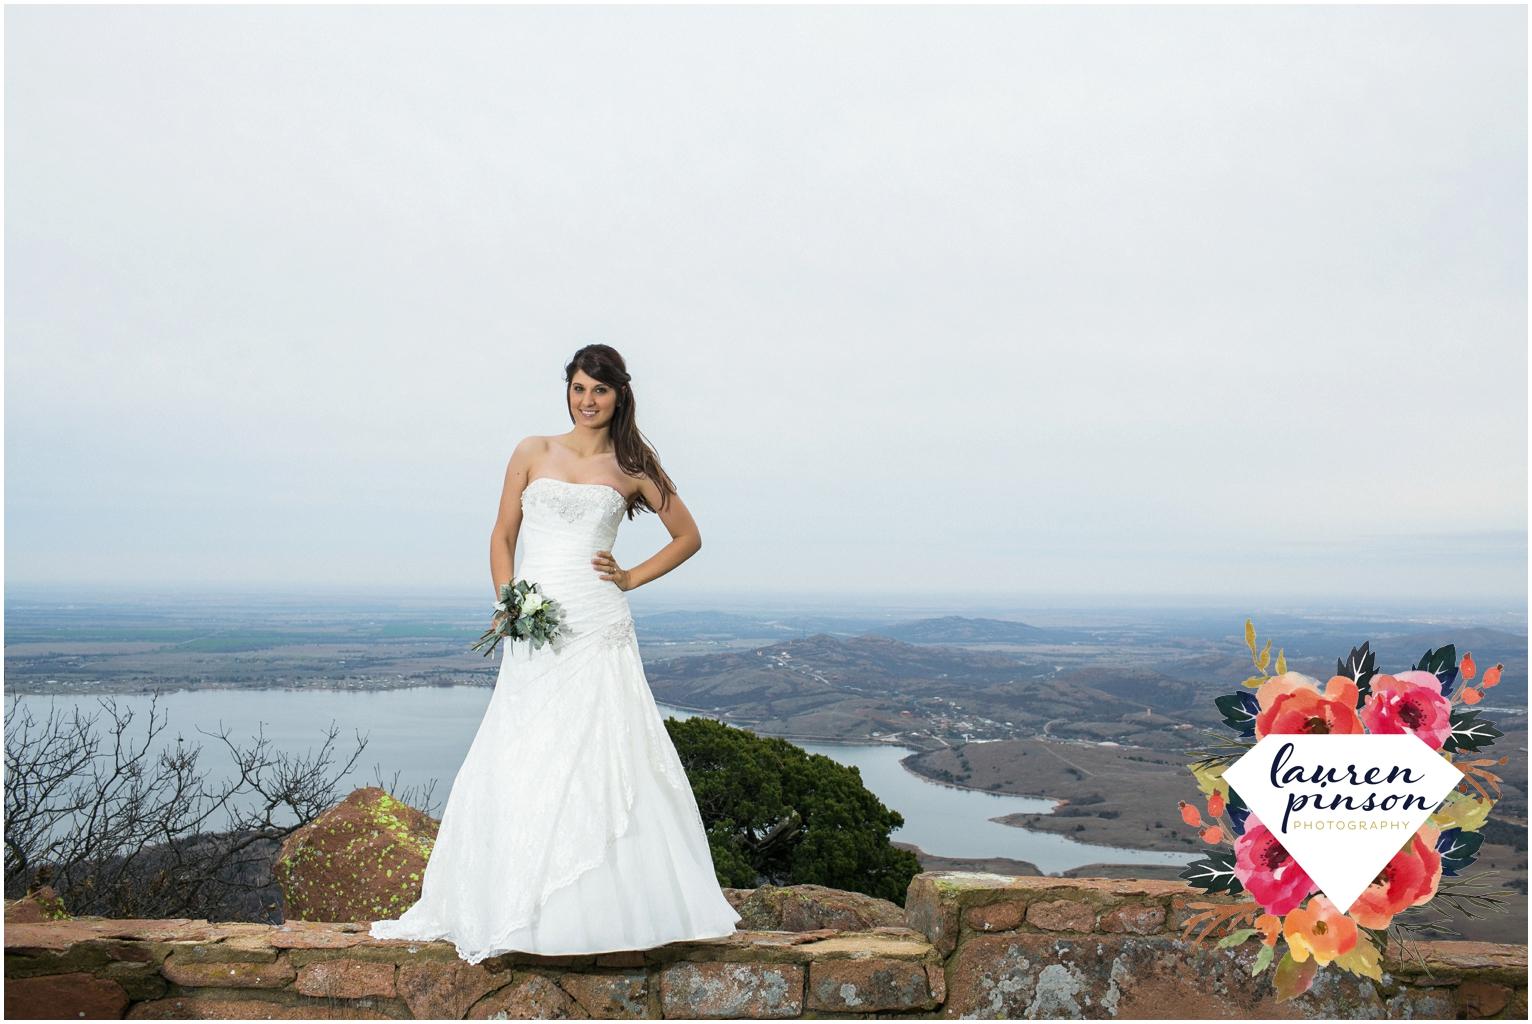 wichita-falls-wedding-photographer-oklahoma-wichita-mountains-bridal-session-bridals-photography_0681.jpg